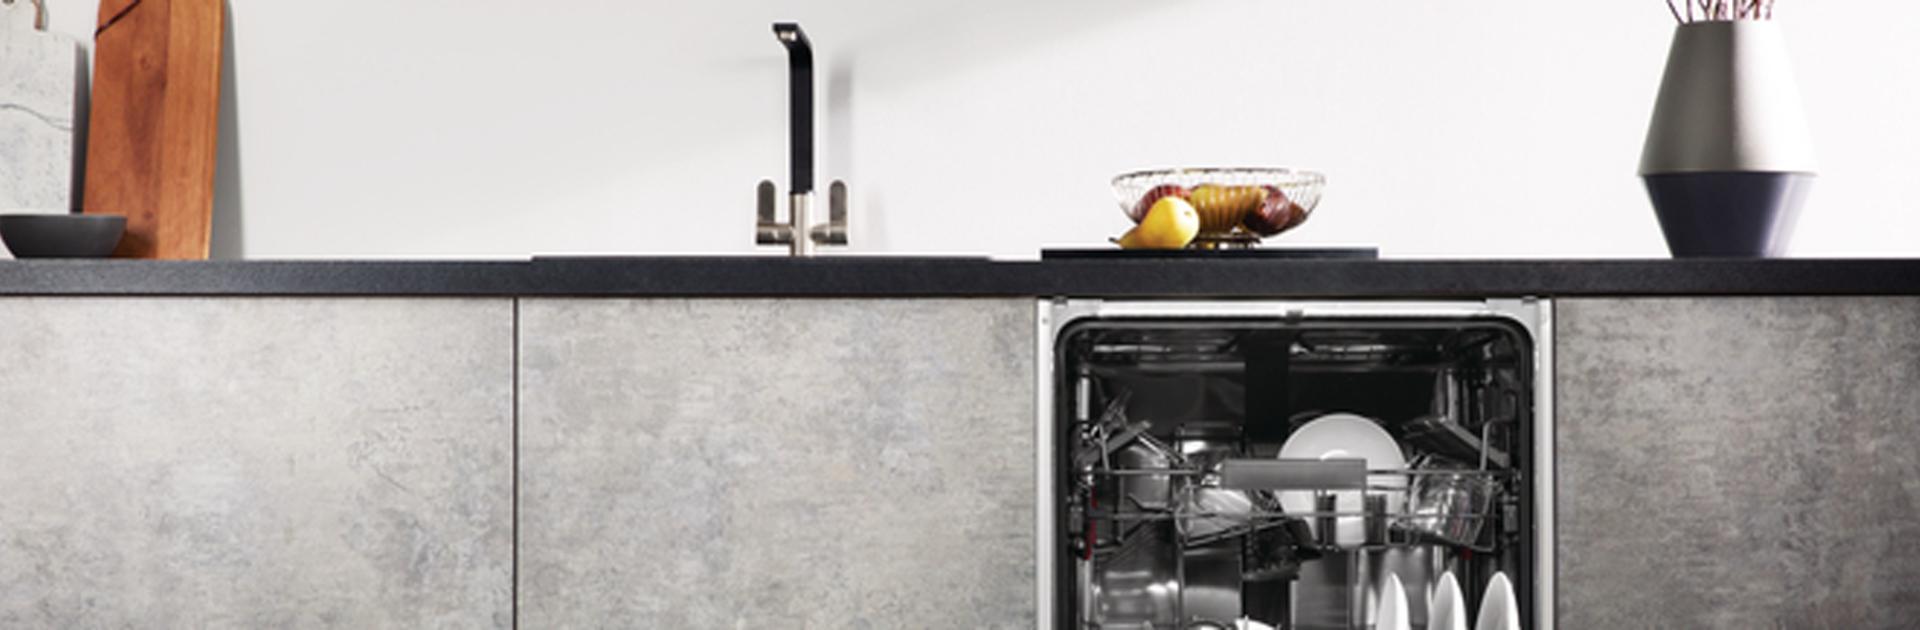 Bauknecht keukenapparatuur | Satink Keukens